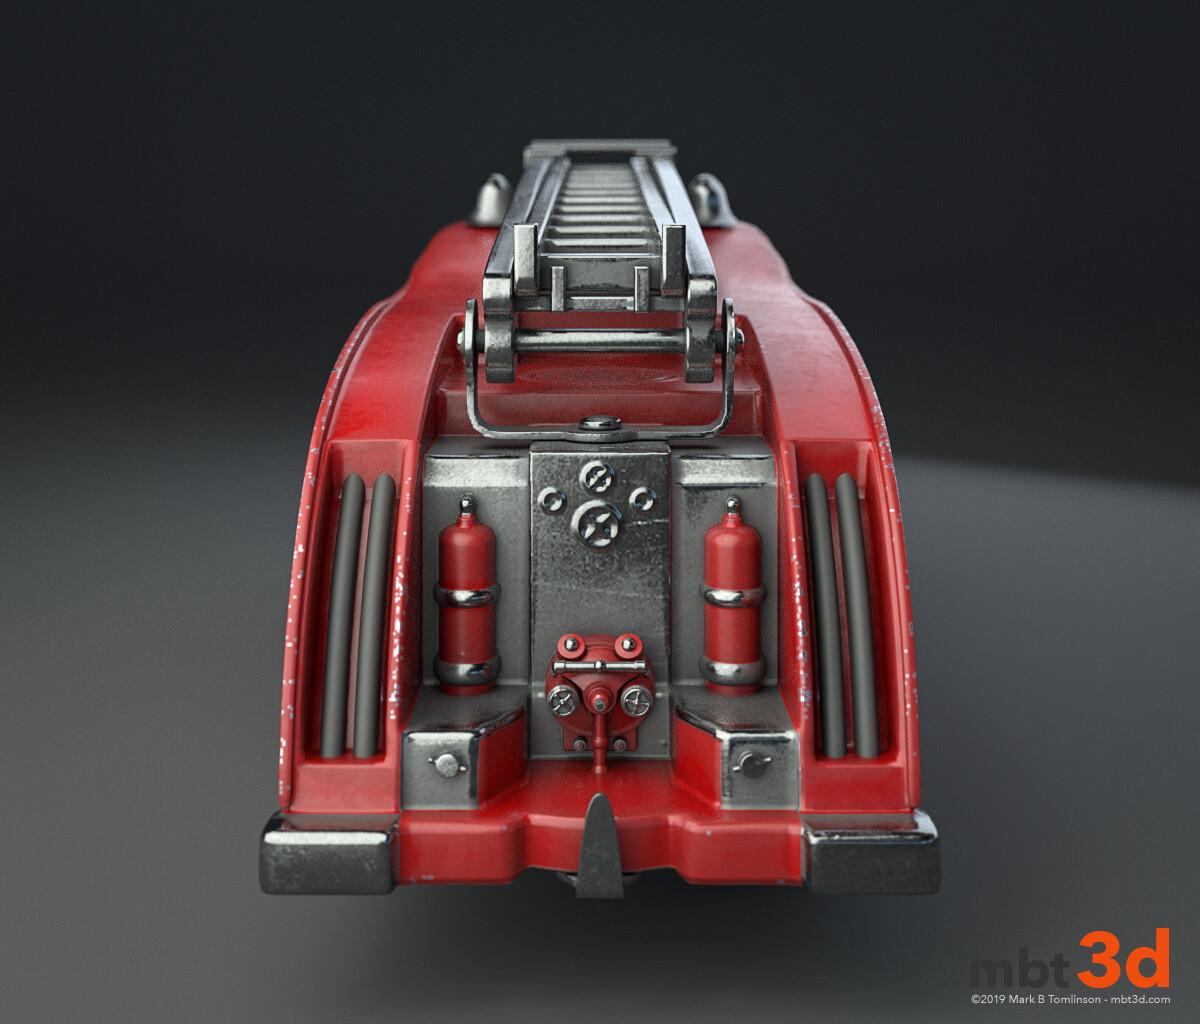 Dinky 555 Fire Engine: